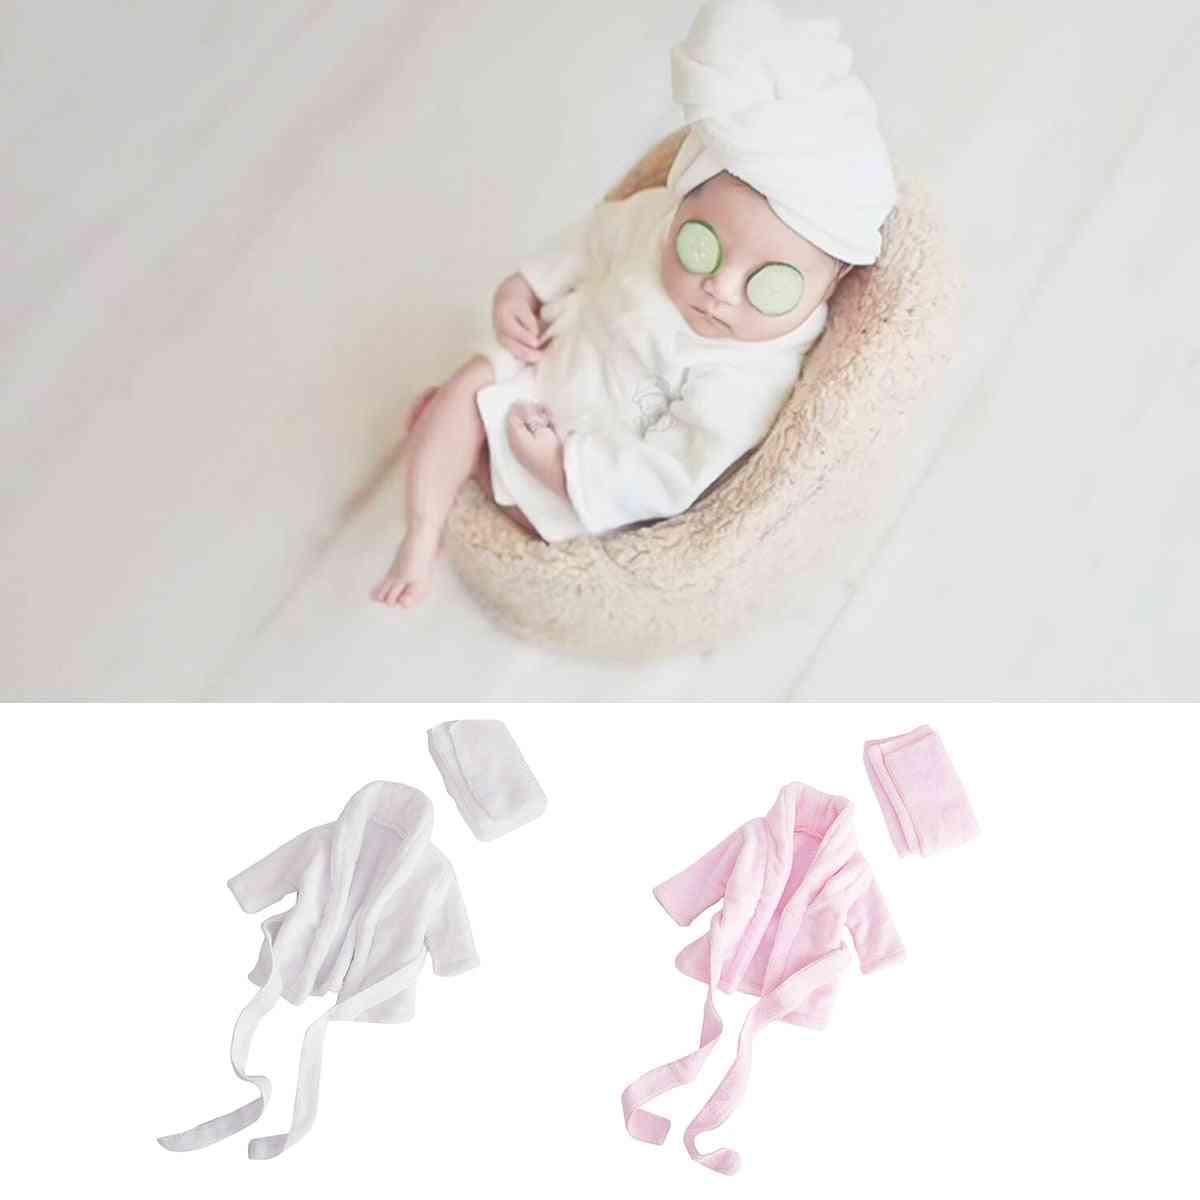 Soft Flannel Bathrobes Newborn Photography Props